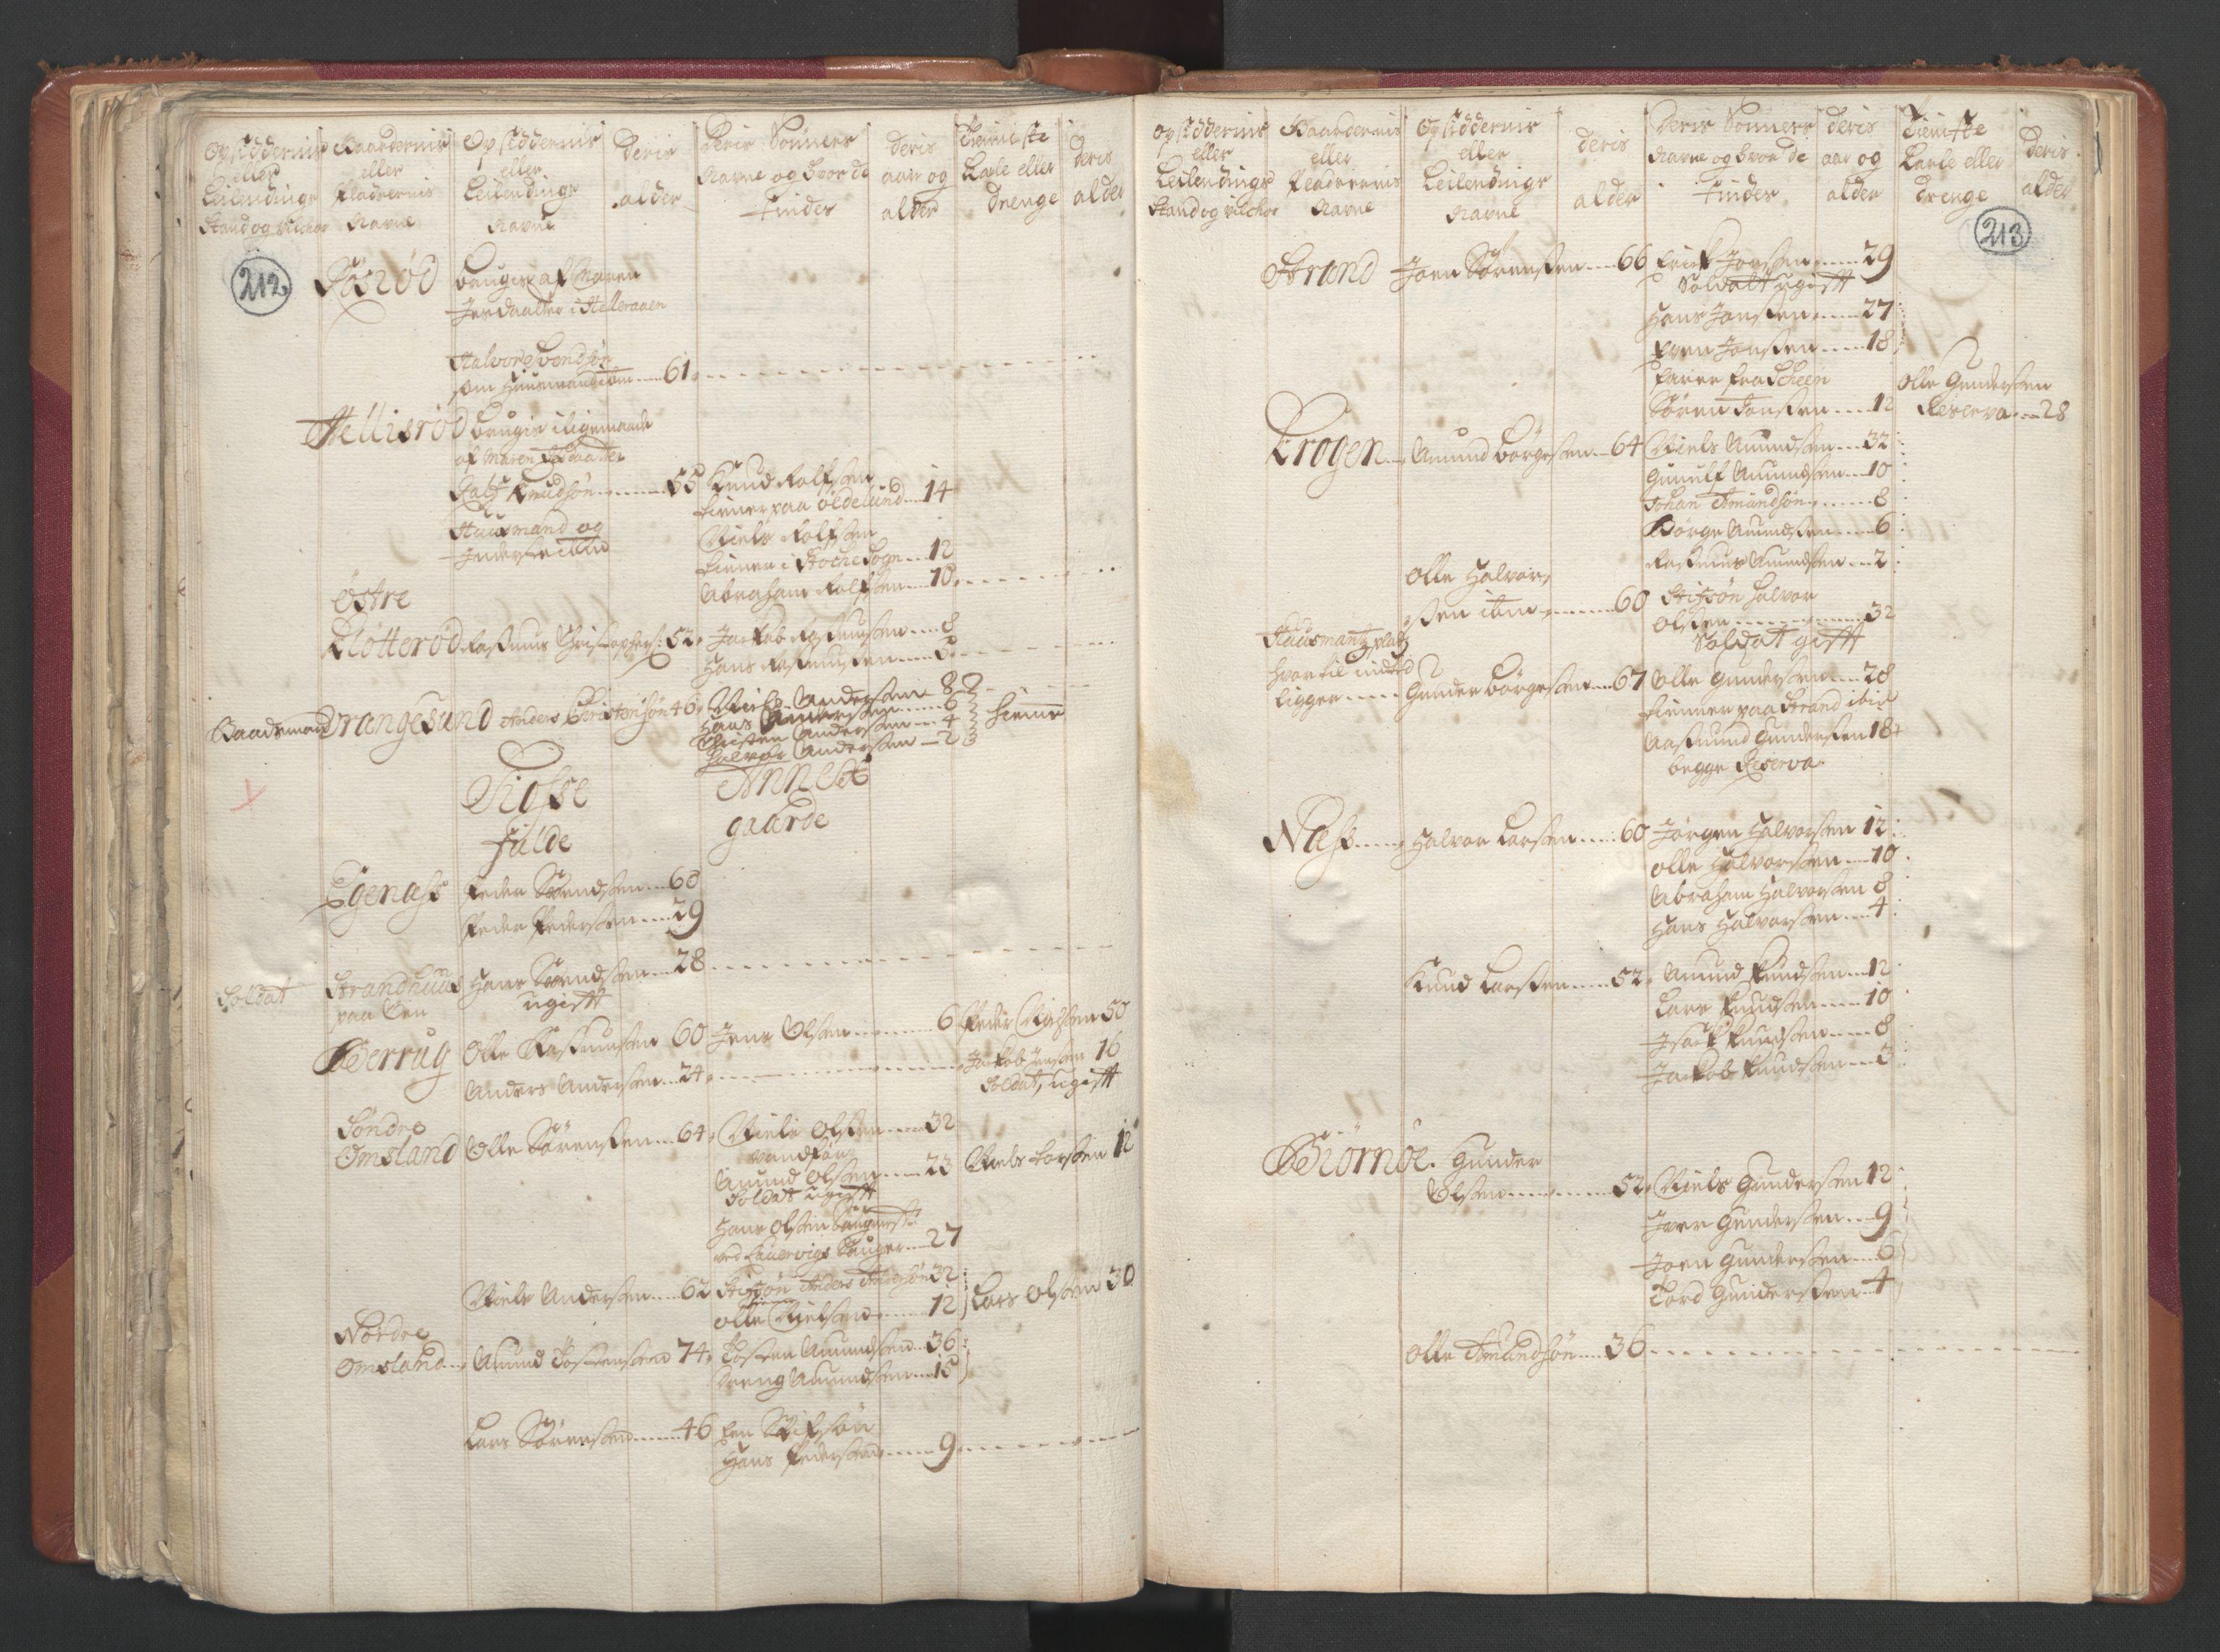 RA, Manntallet 1701, nr. 2: Solør, Odal og Østerdal fogderi og Larvik grevskap, 1701, s. 212-213